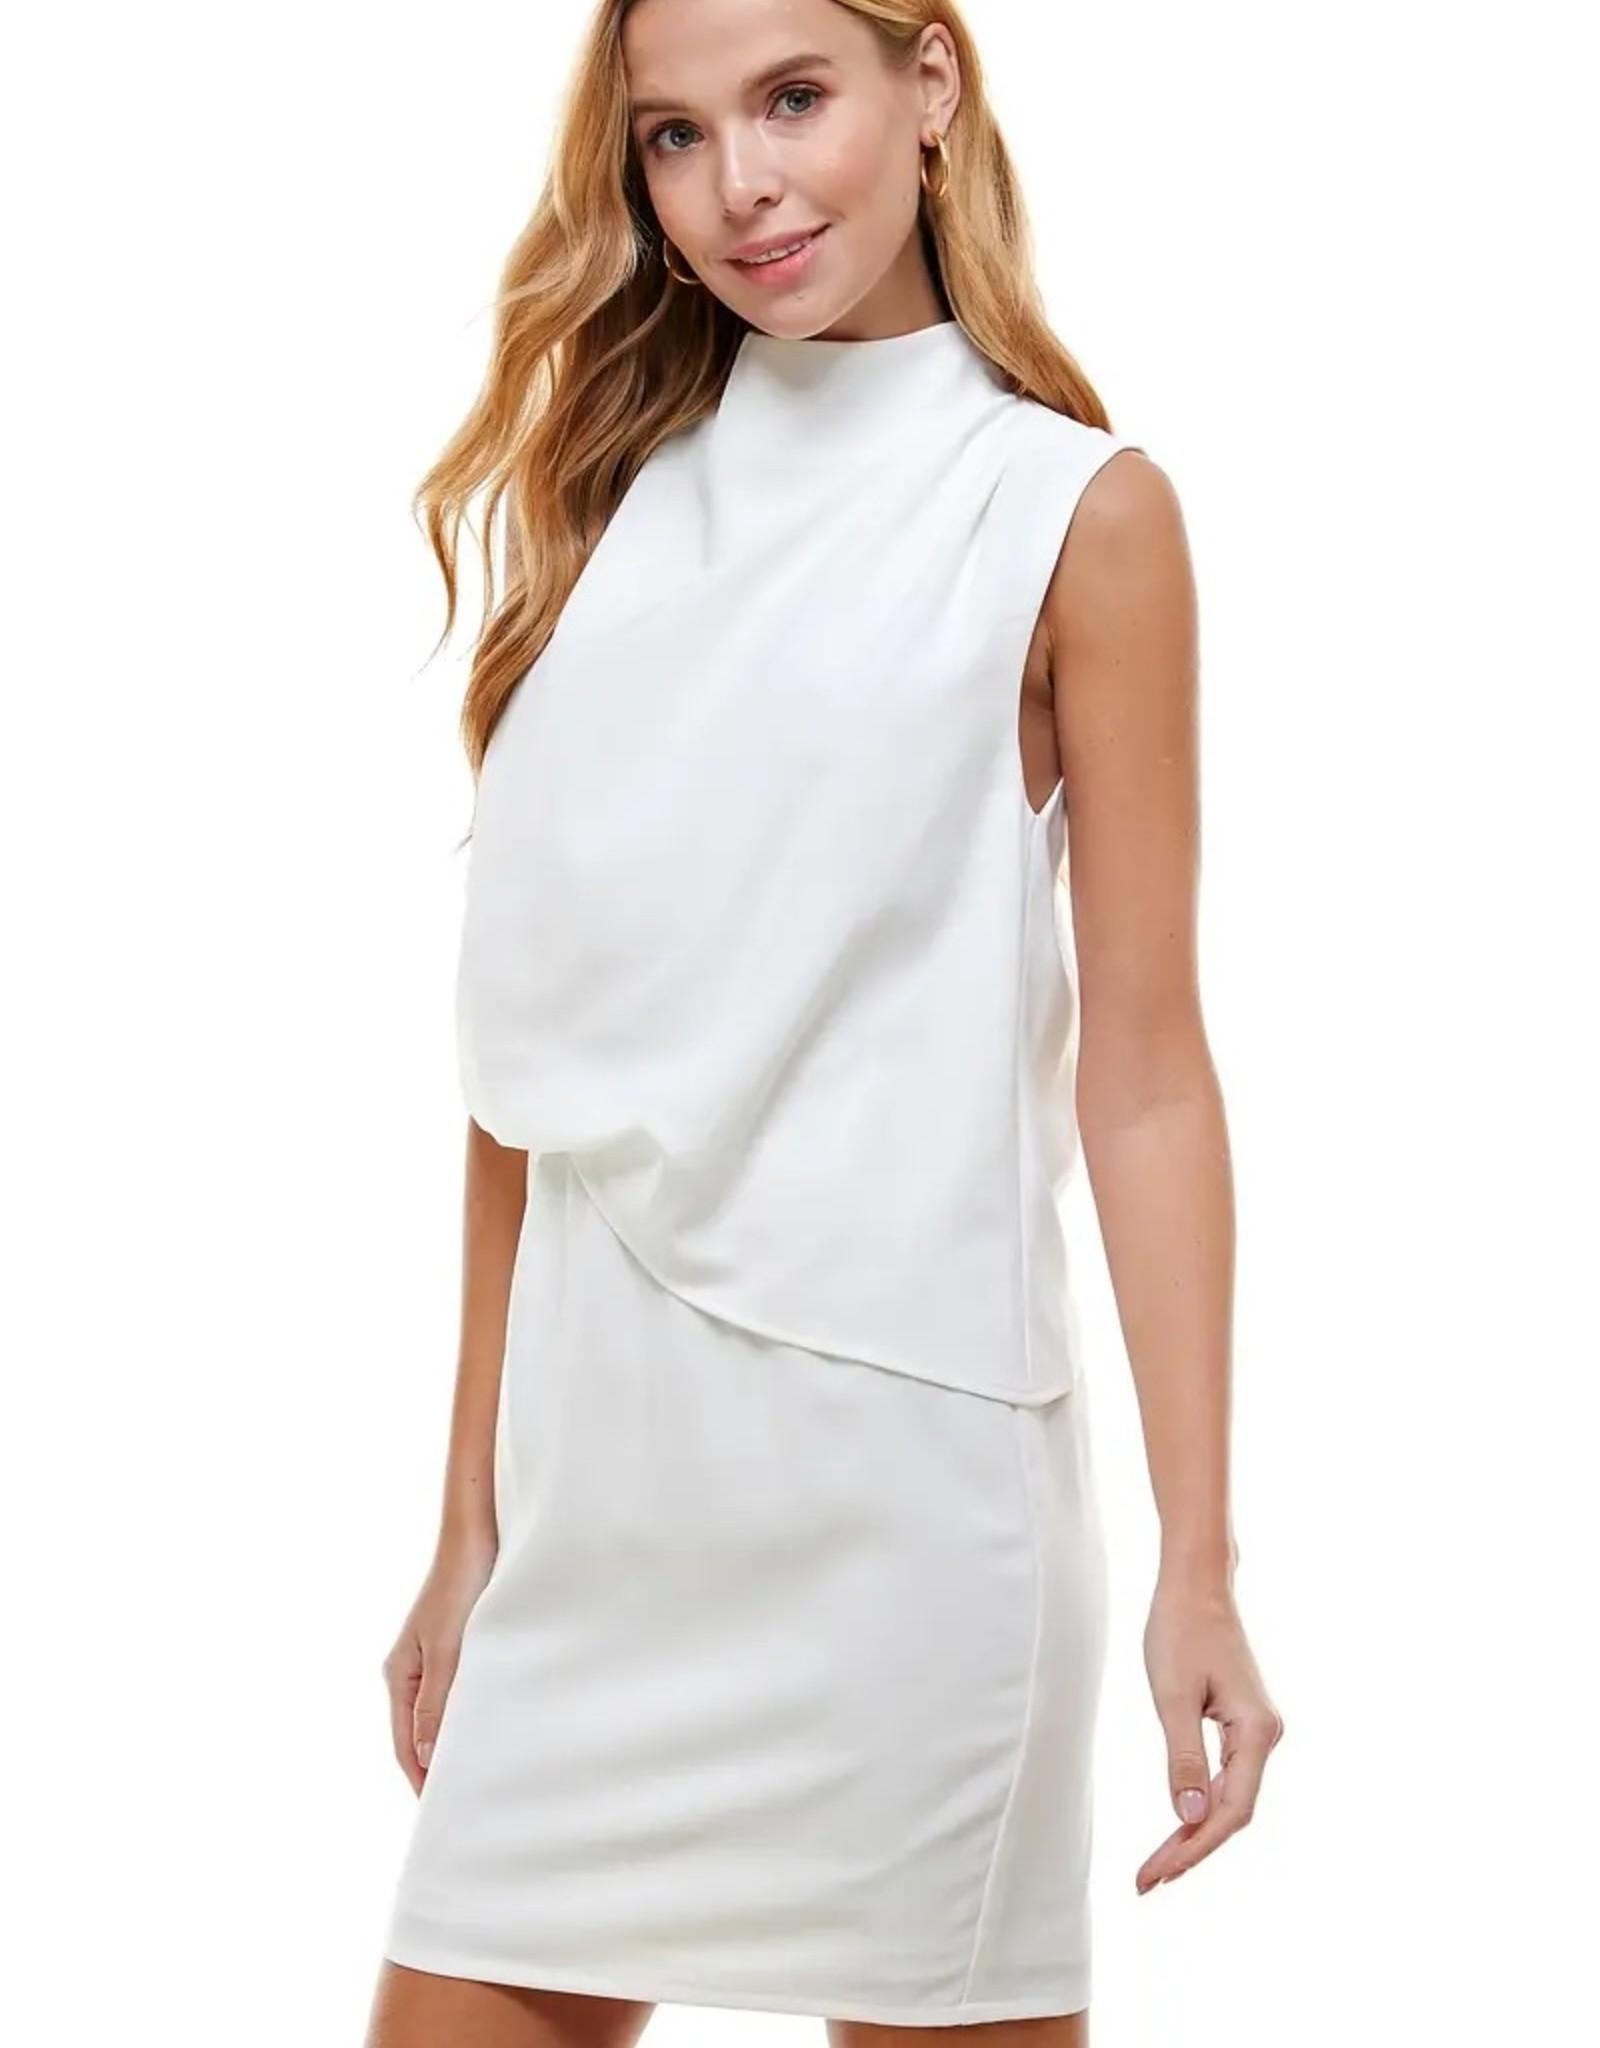 Marlow White Dress